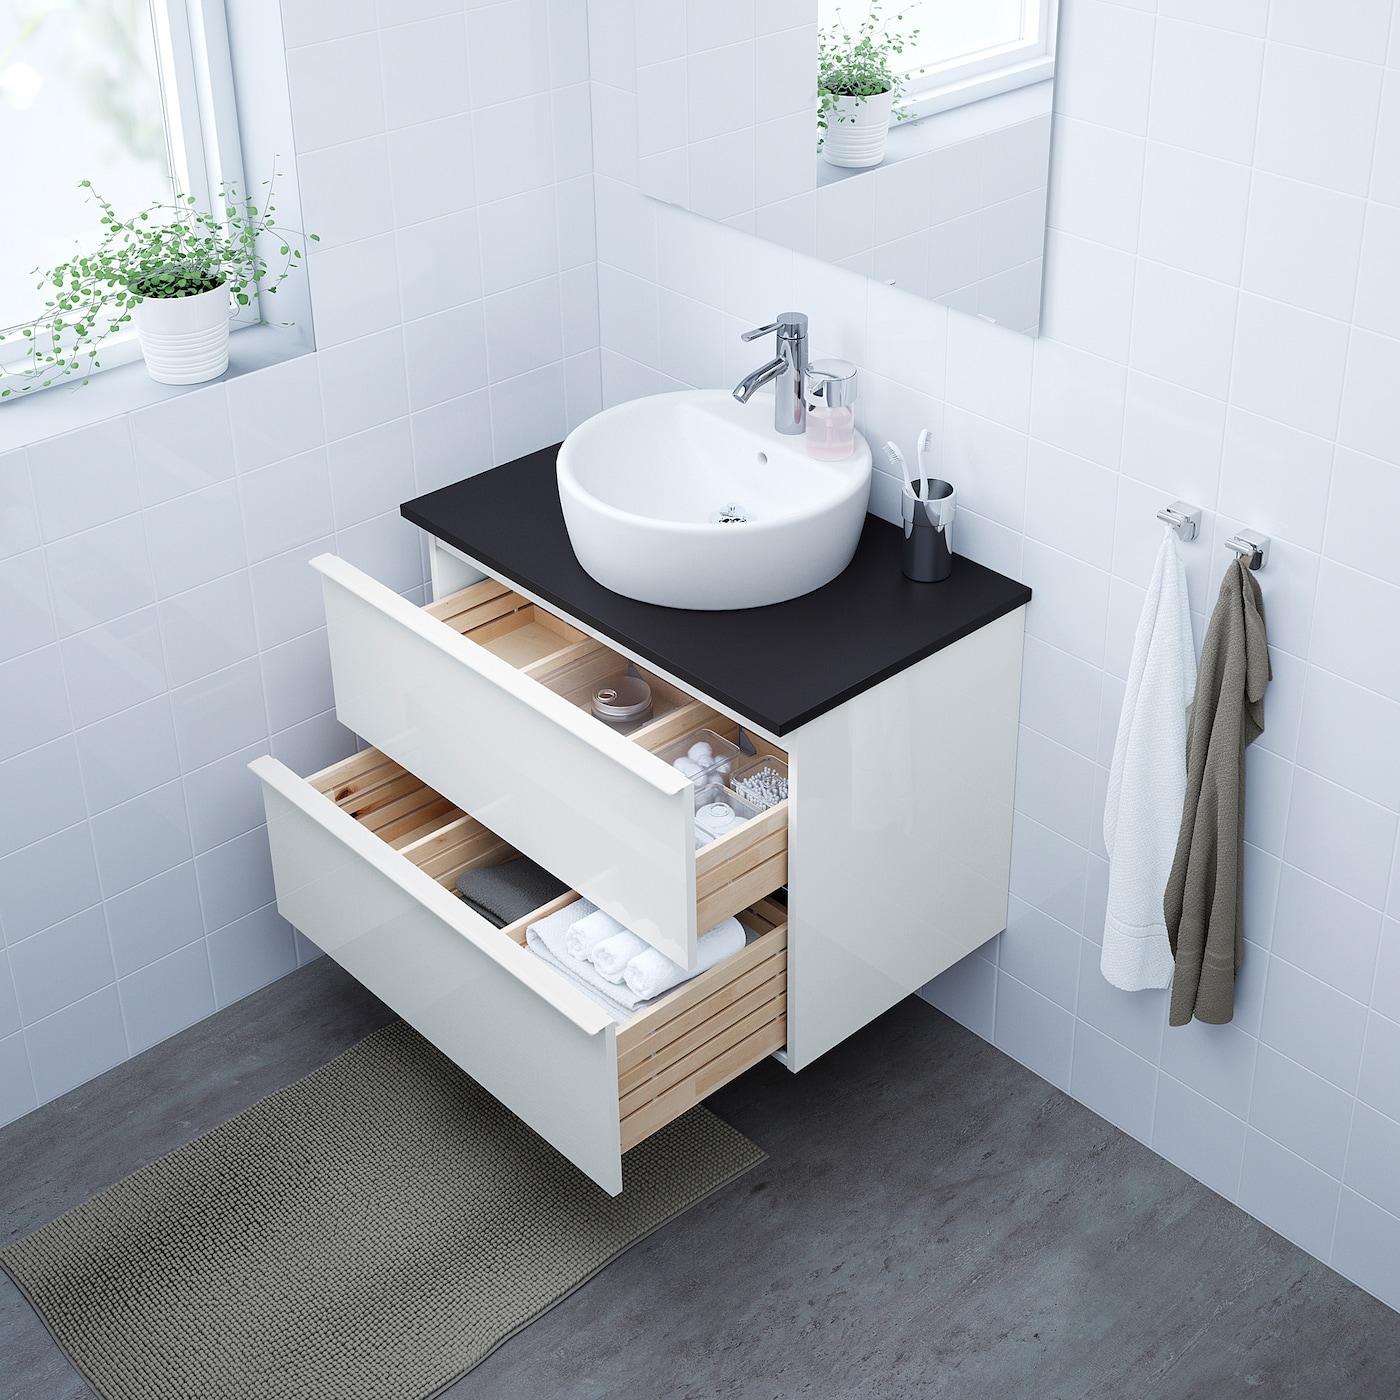 Elegant Meuble Salle De Bains Ikea Godmorgon